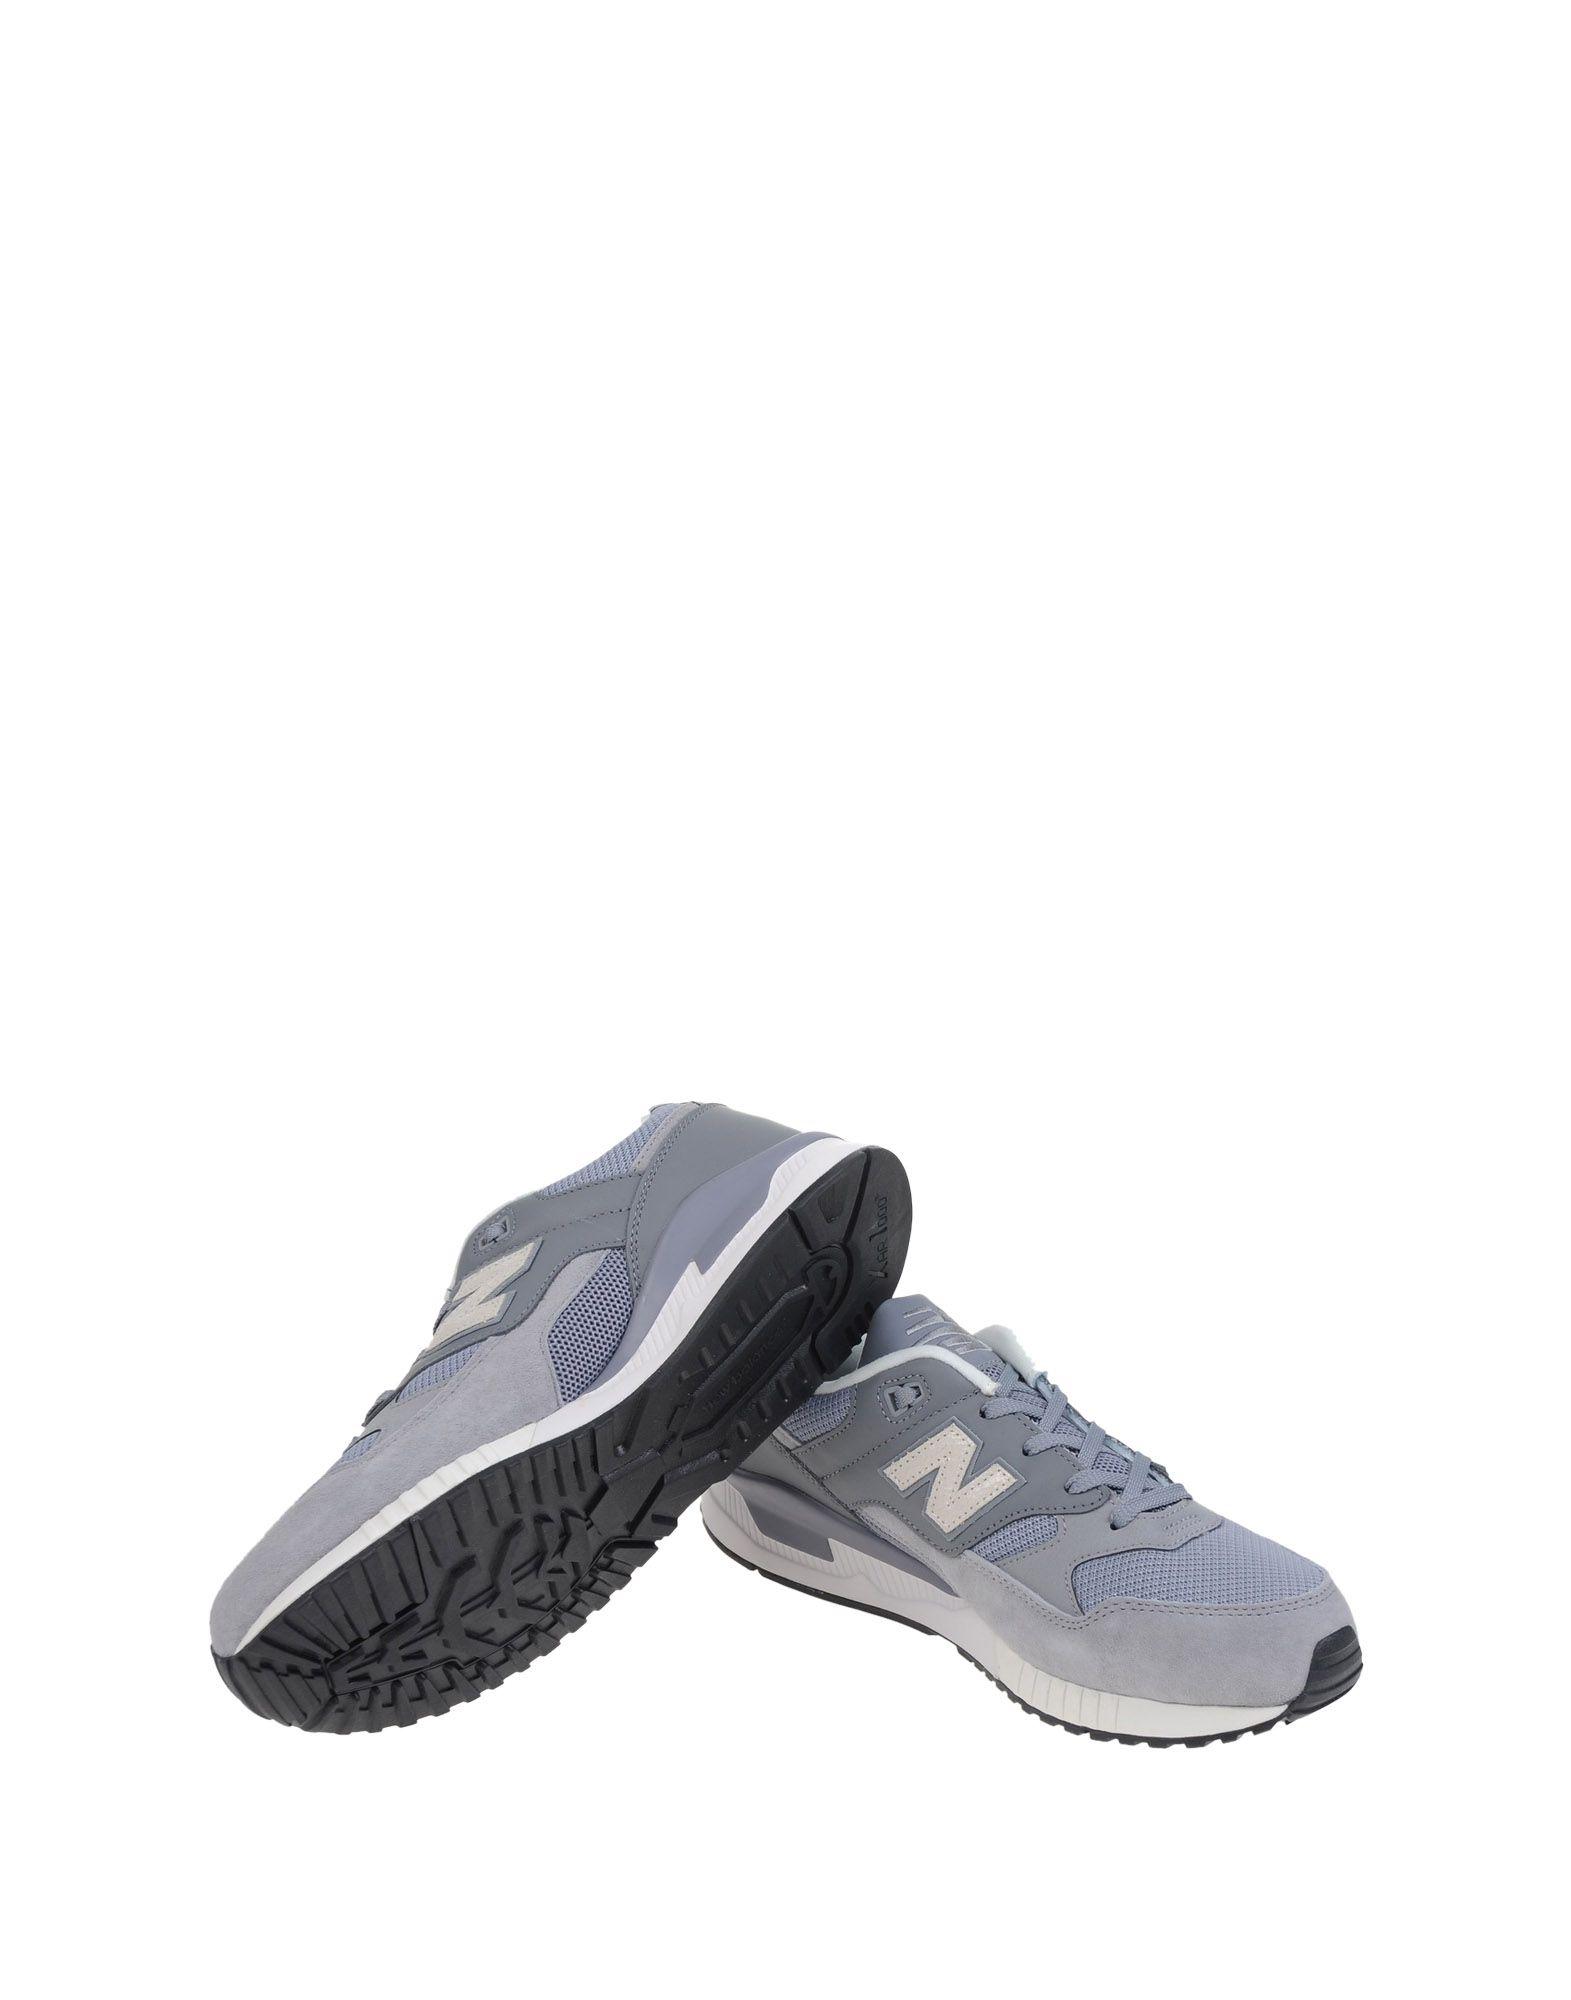 Rabatt echte Schuhe Oxidized New Balance 530 Oxidized Schuhe  11105802OD e27682